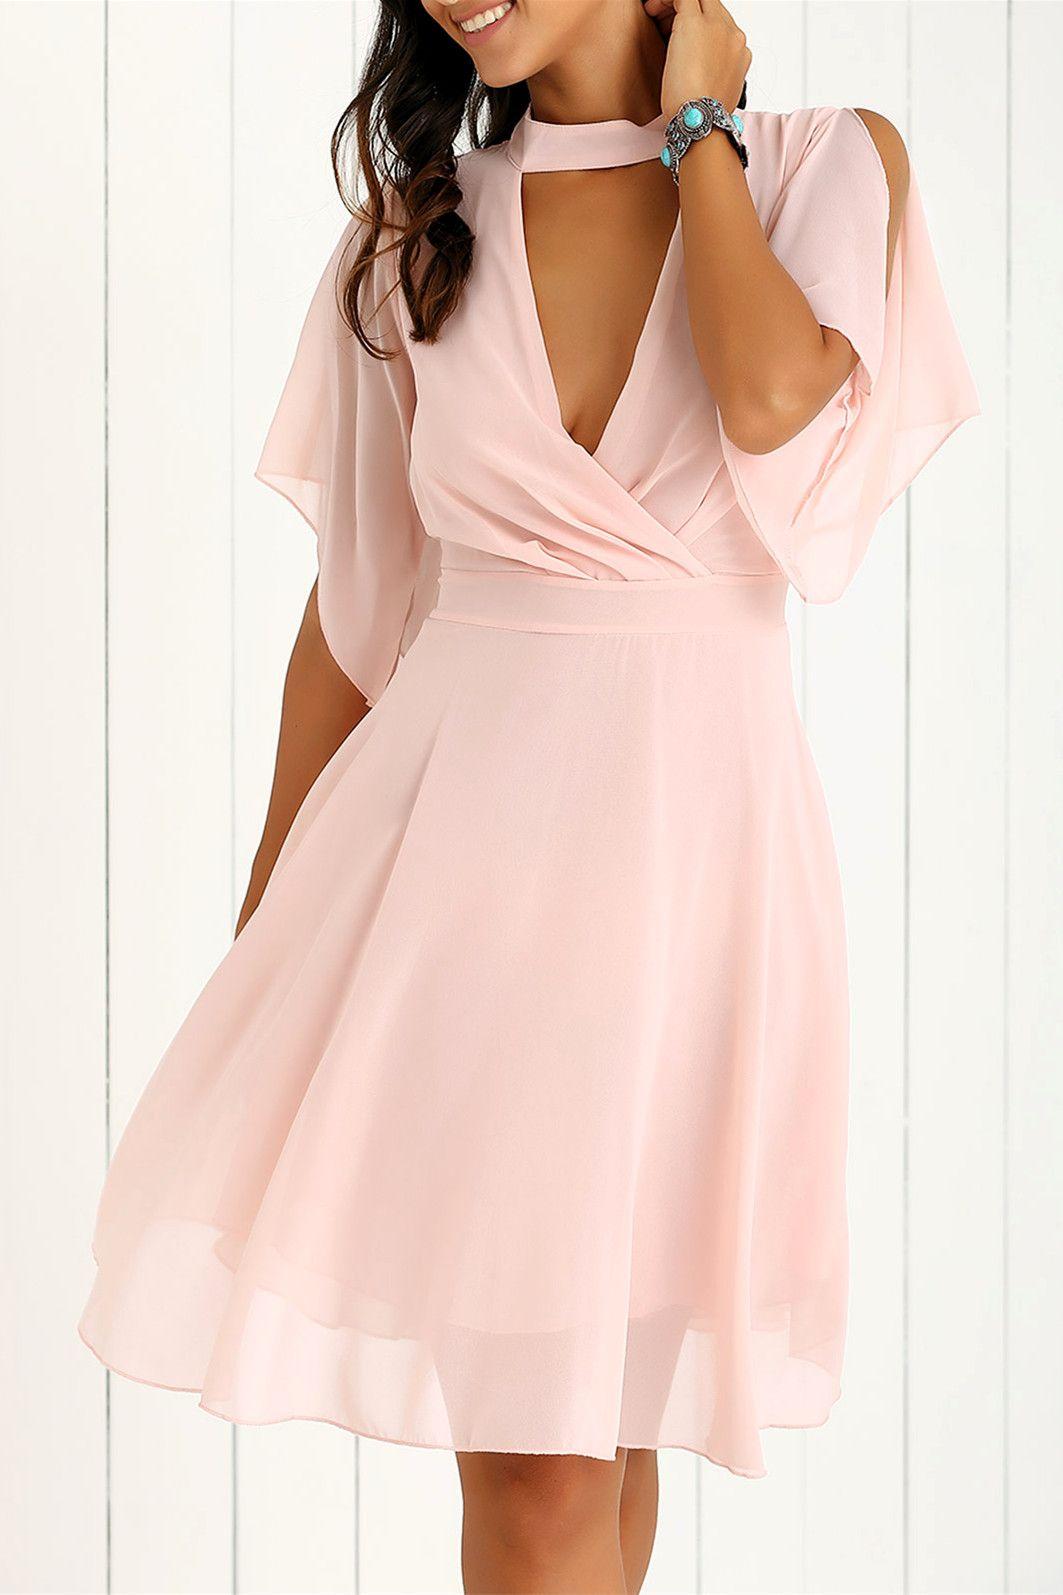 Petal Sleeve Knee Length Chiffon Pastel Pleated Dress - Pink - 2xl ...